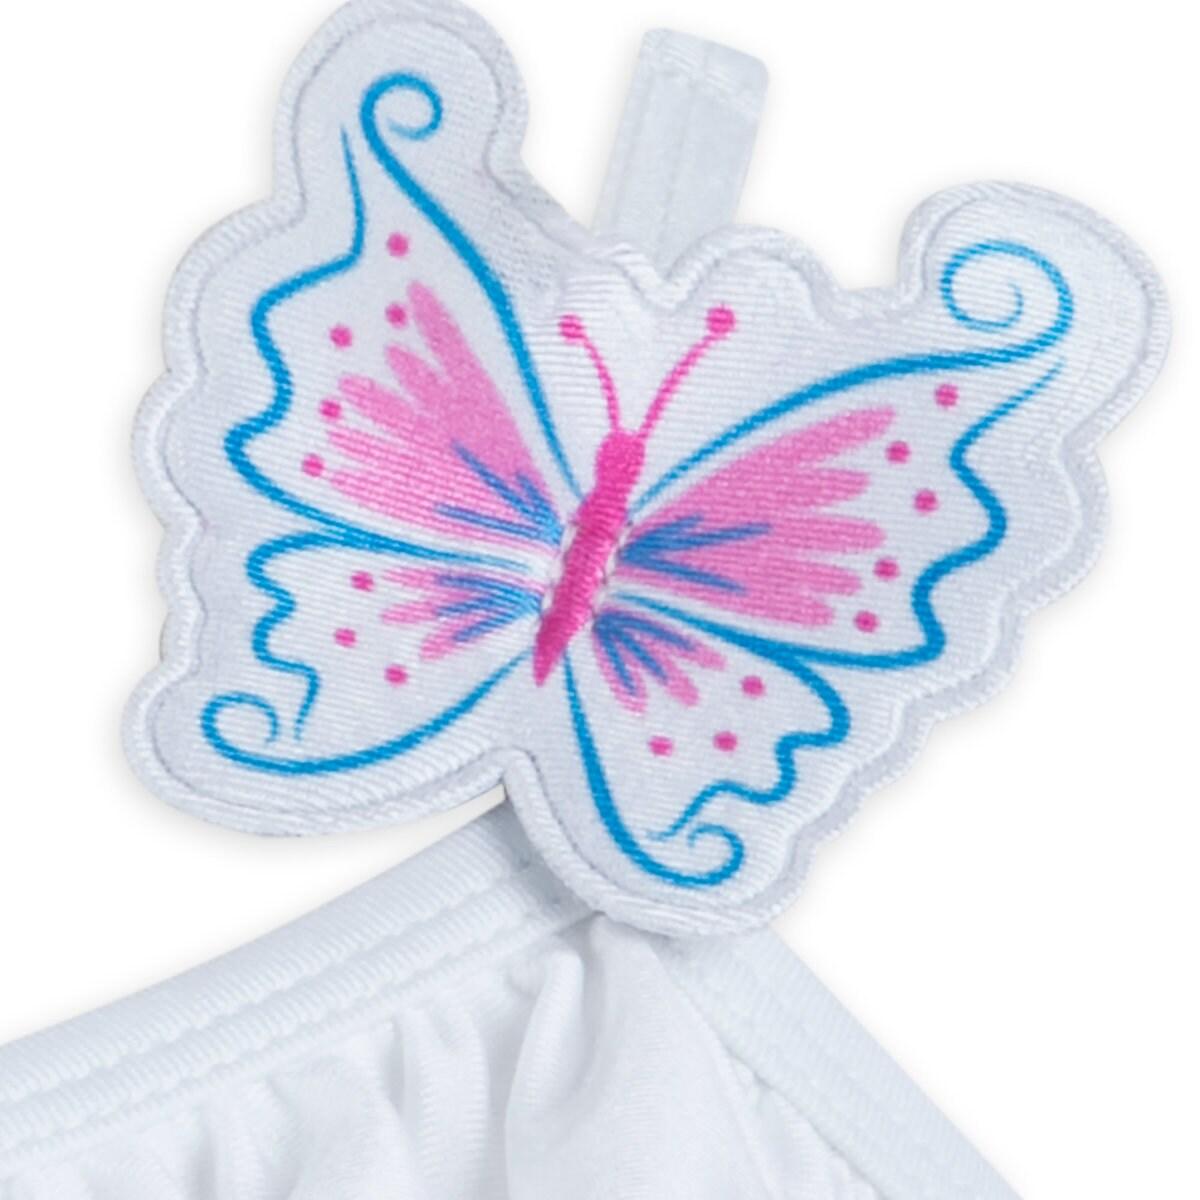 95ead7e92c Product Image of Fancy Nancy Deluxe Leotard Dress for Girls   3